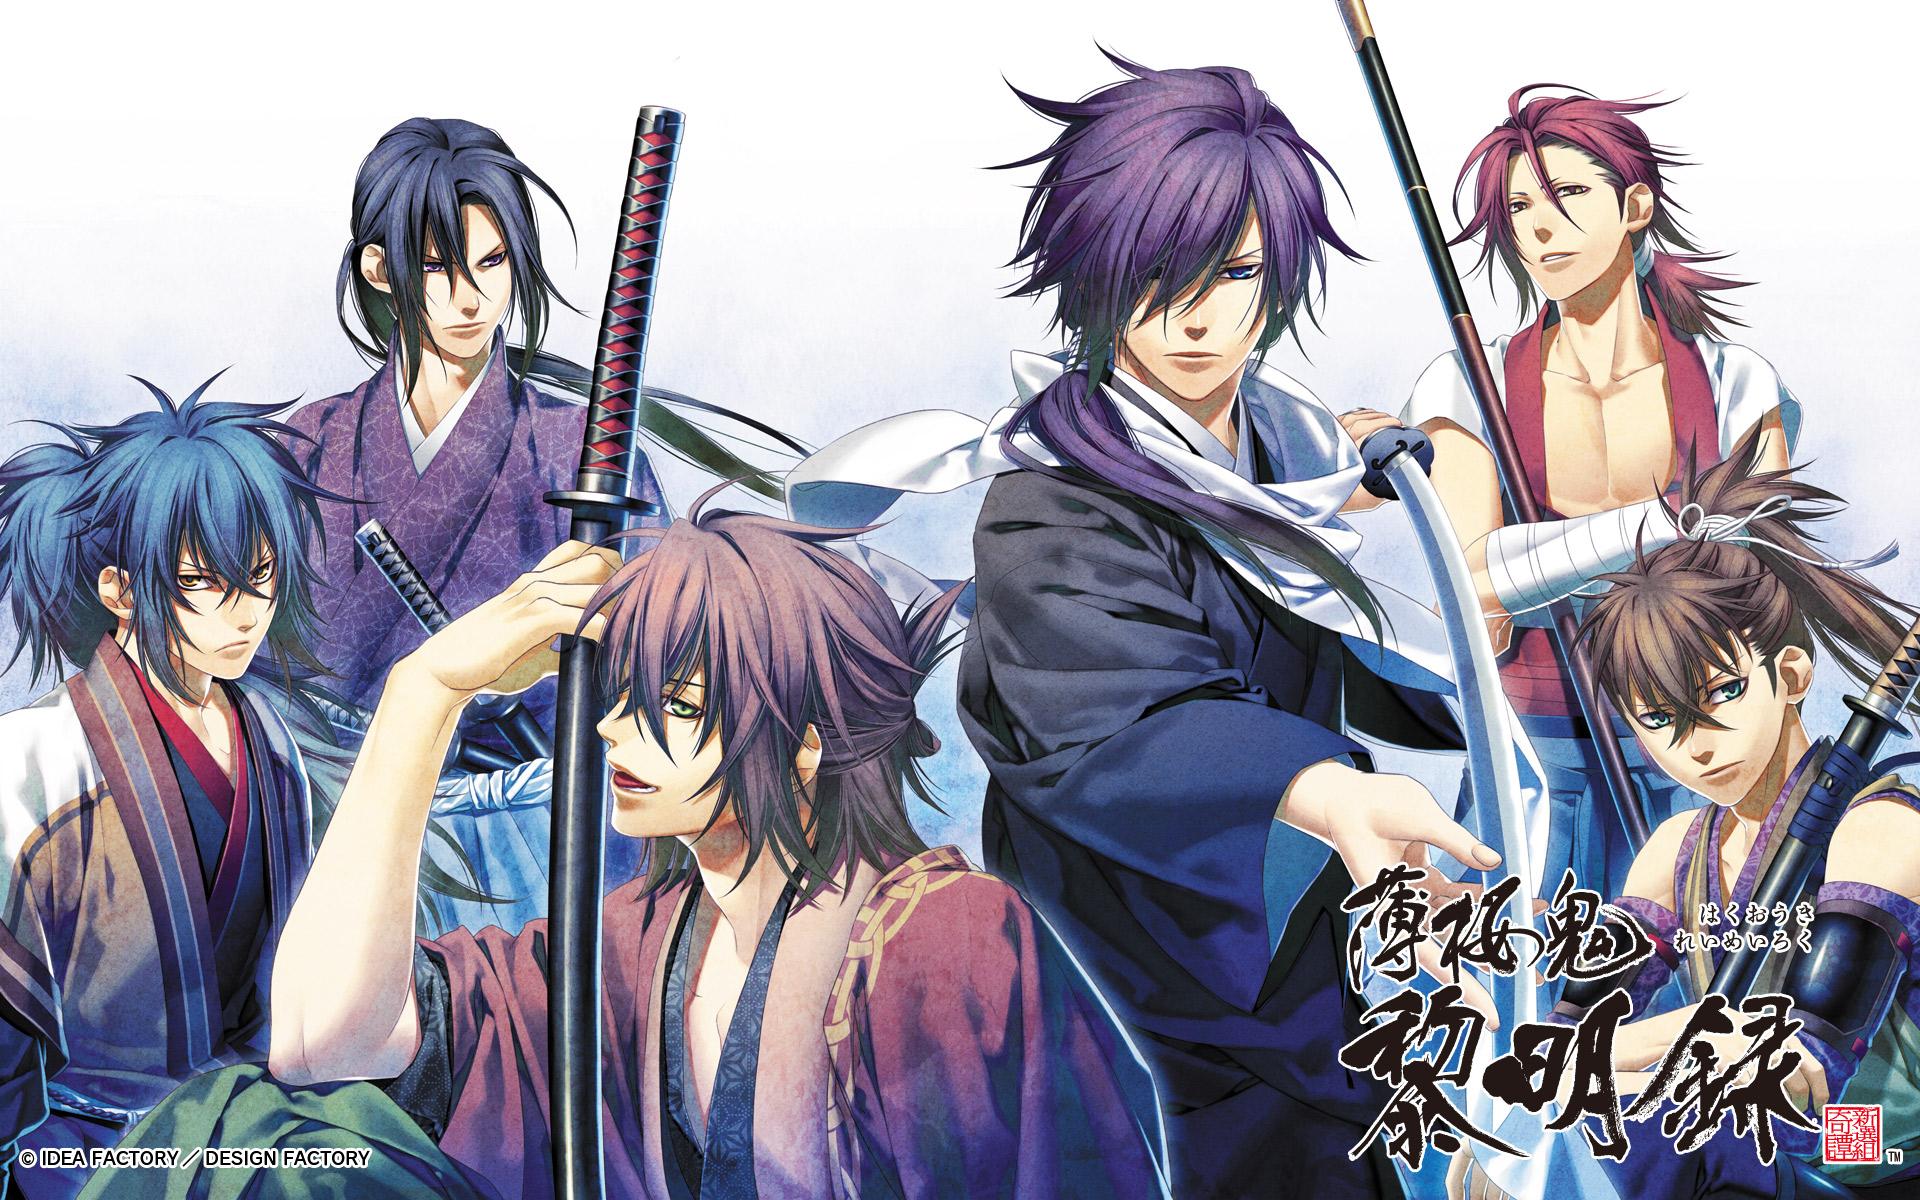 Hakuouki Shinsengumi Kitan Full